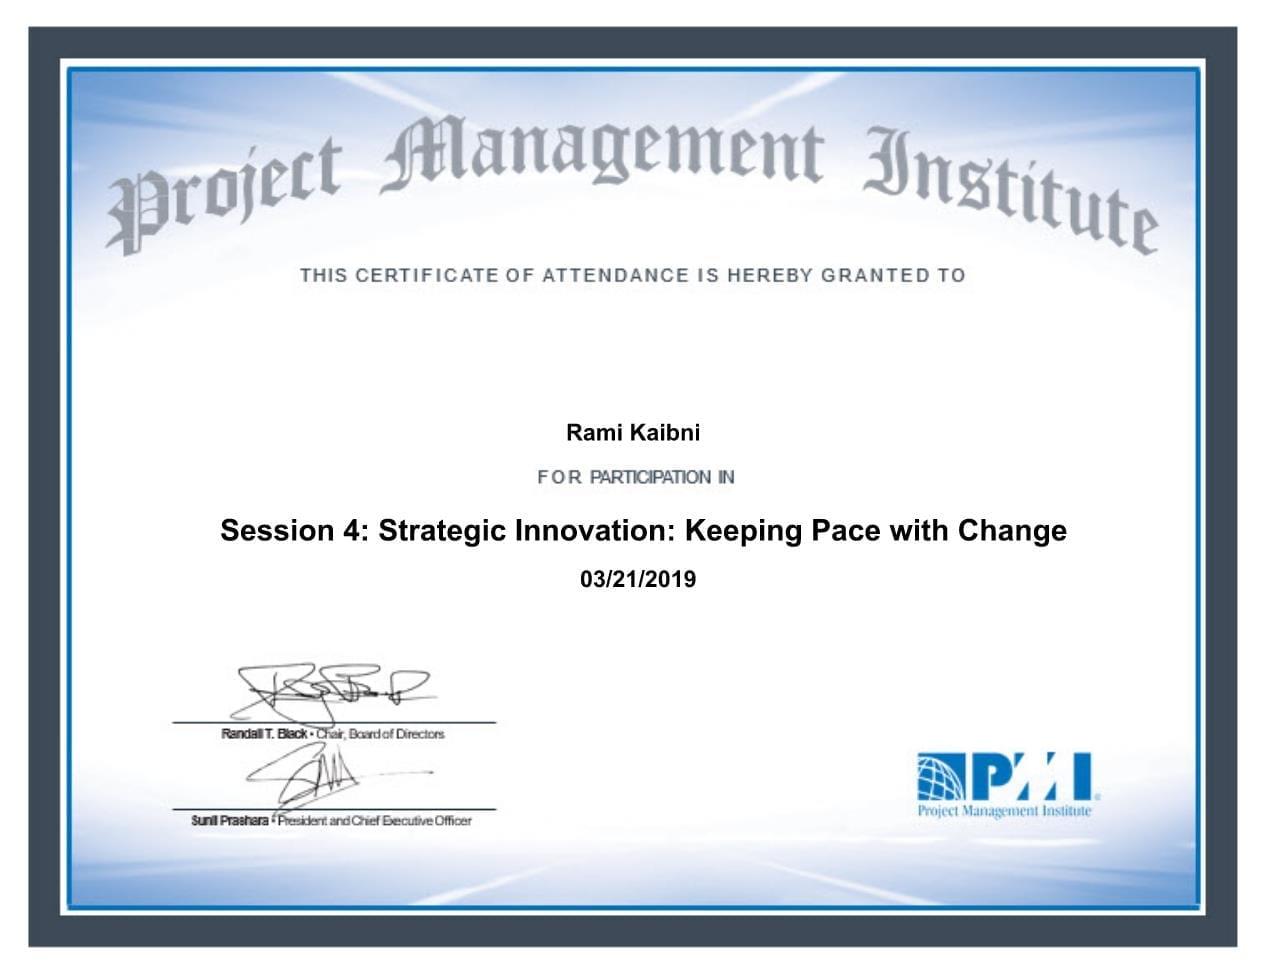 Session 4 - Strategic Innovation